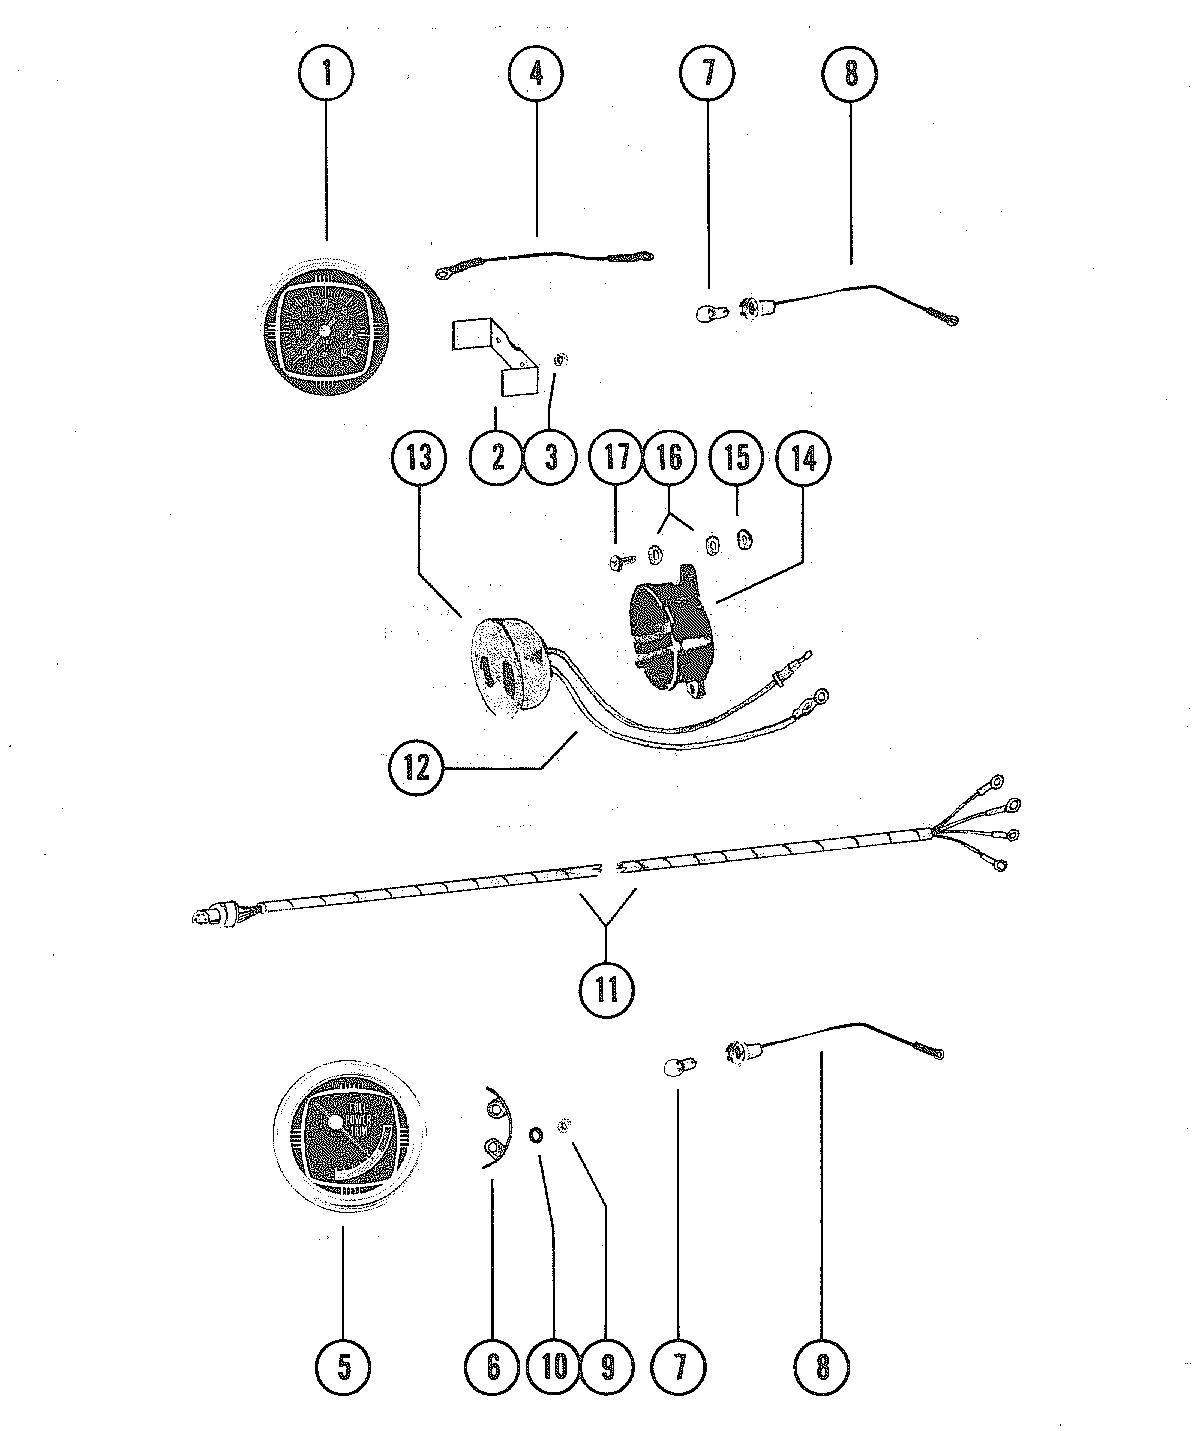 TACHOMETER, TRIM GAUGE AND ALARM HORN FOR MERCURY MERC V-225